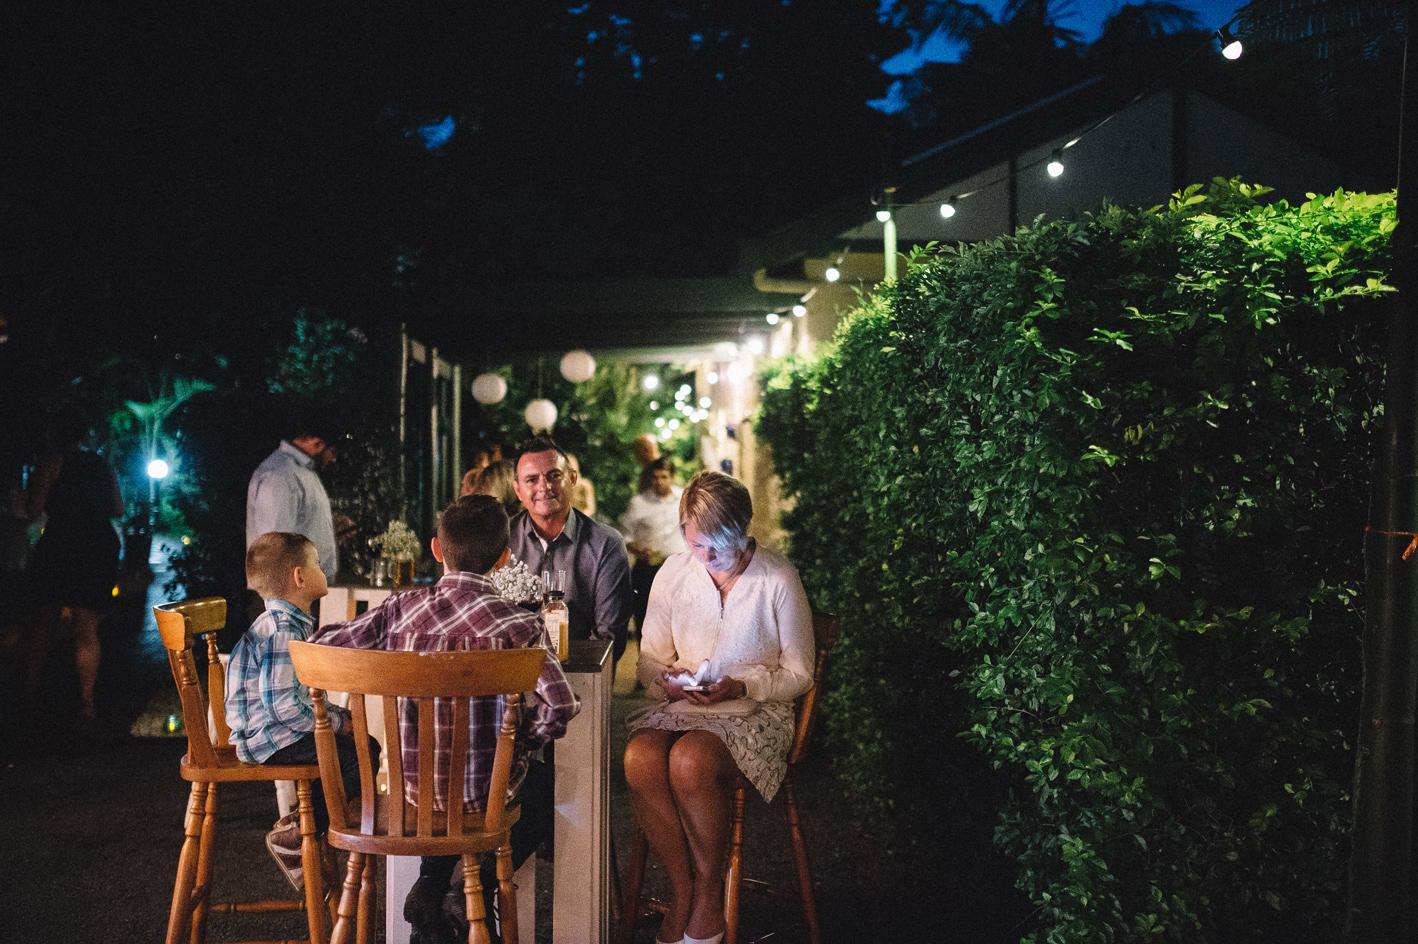 080-michelle-reagan-mount-tamborine-wedding-sophie-baker-photography